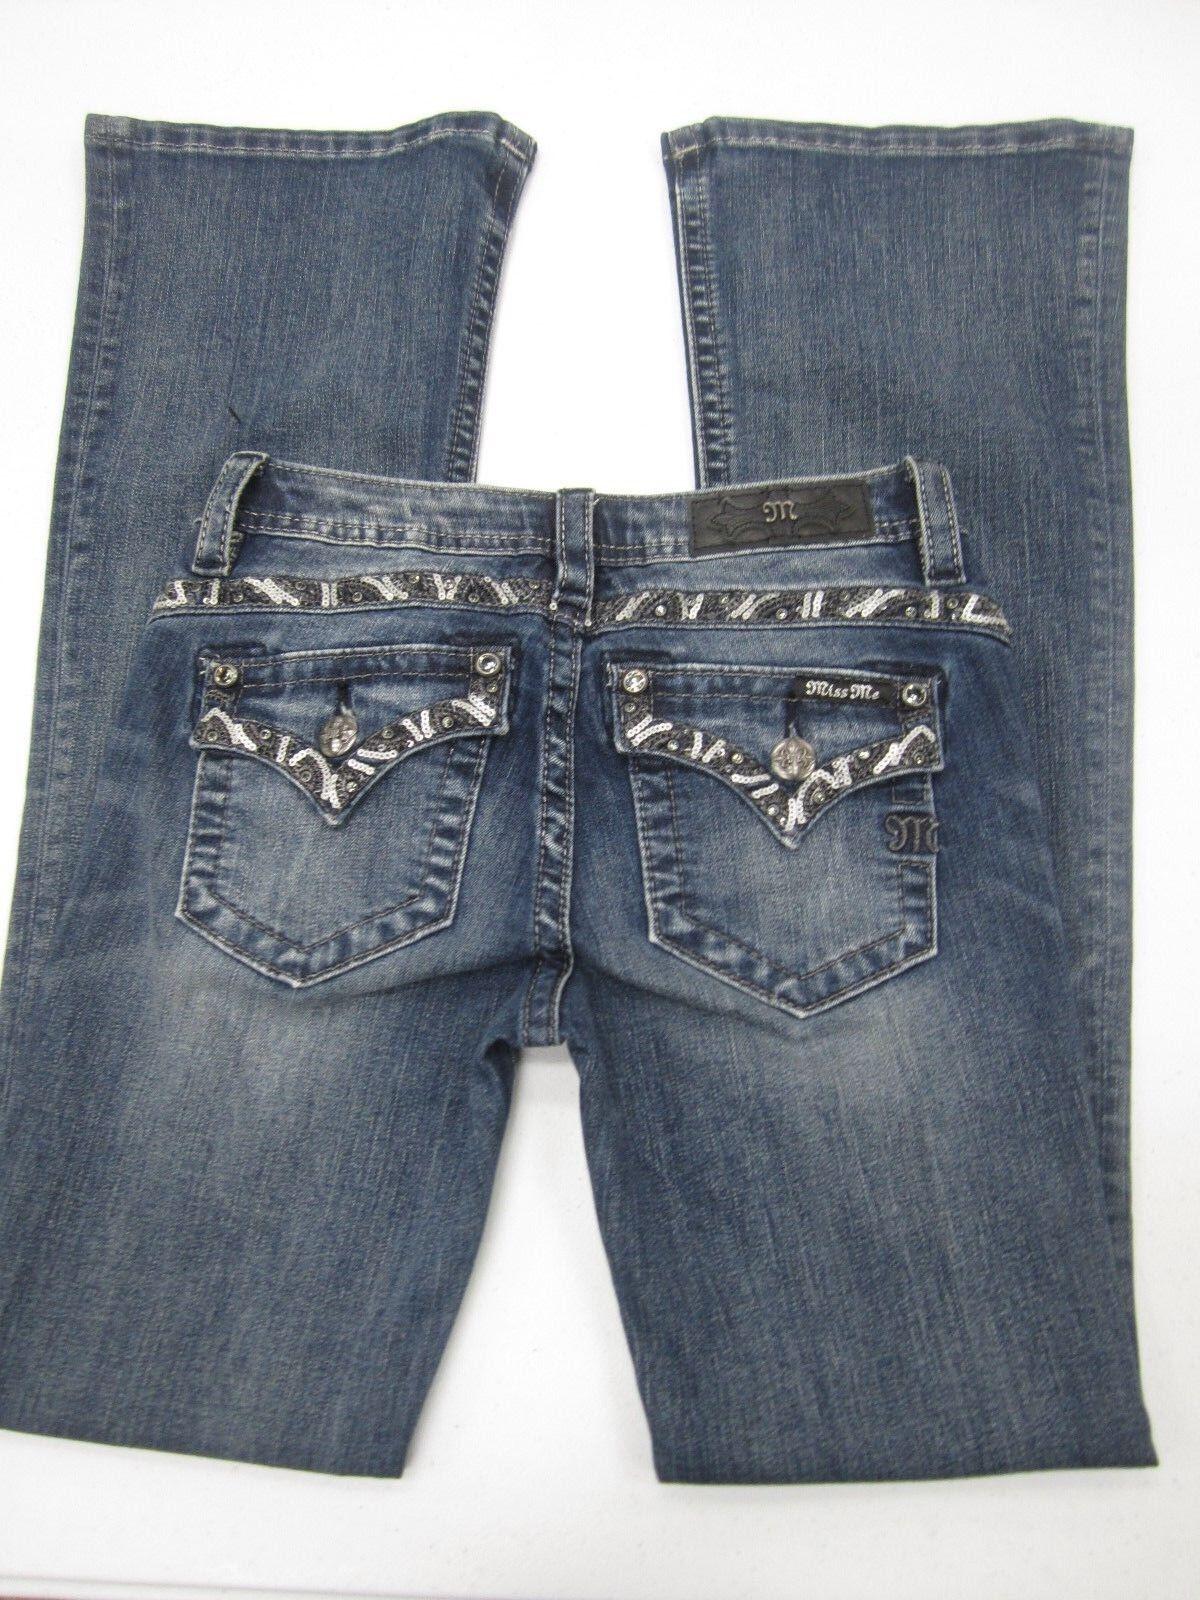 NWOT Miss Me Juniors  Girls Jeans JK761GB3 Boot Med bluee CUTE Bling 14 x 30